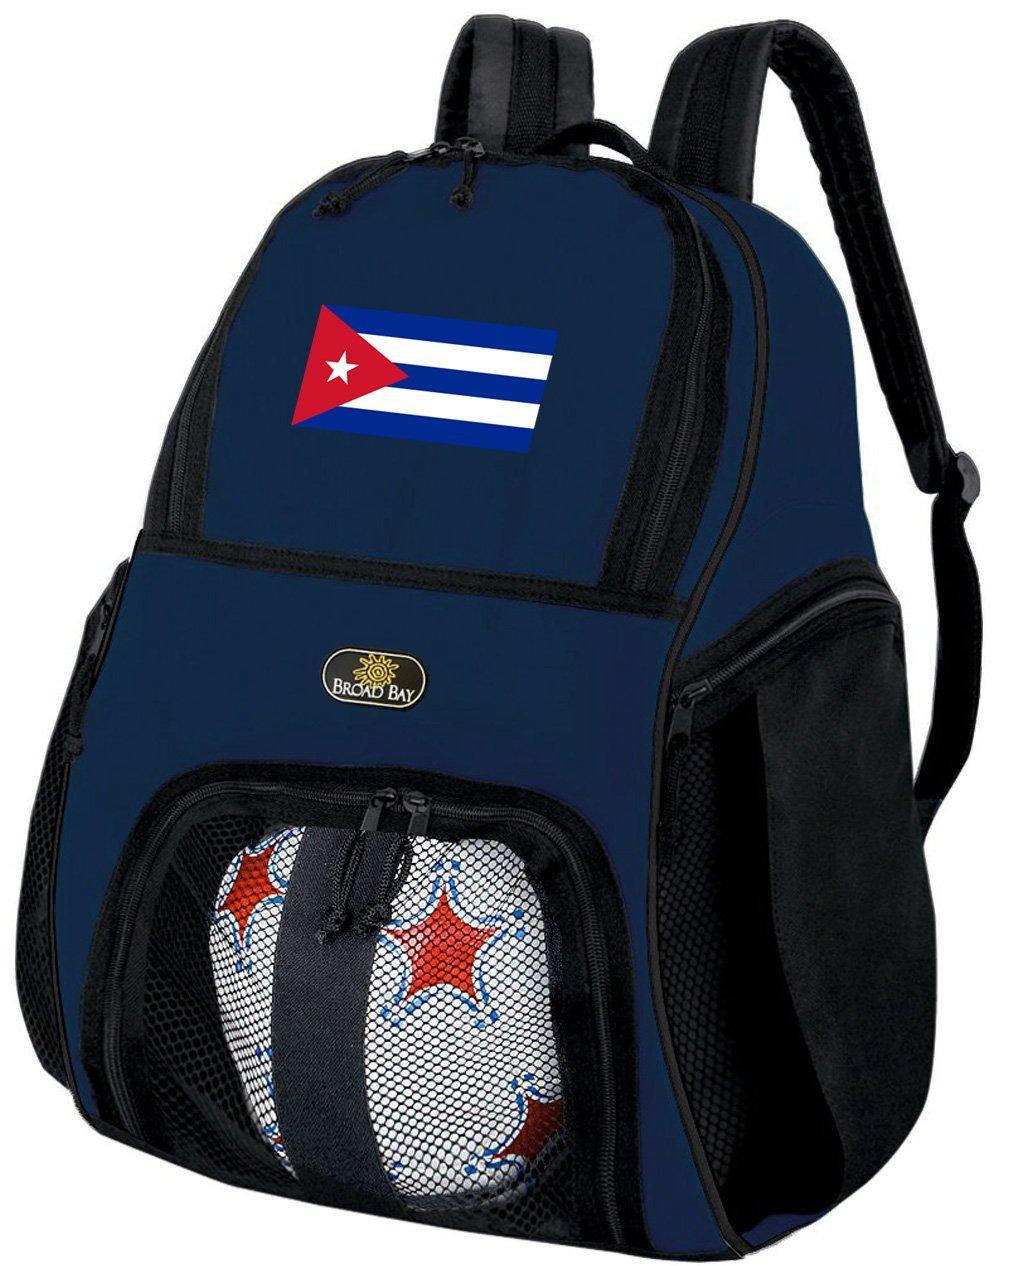 Broad Bayキューバサッカーバックパックバレーボールバッグネイビー   B07D193R7Z